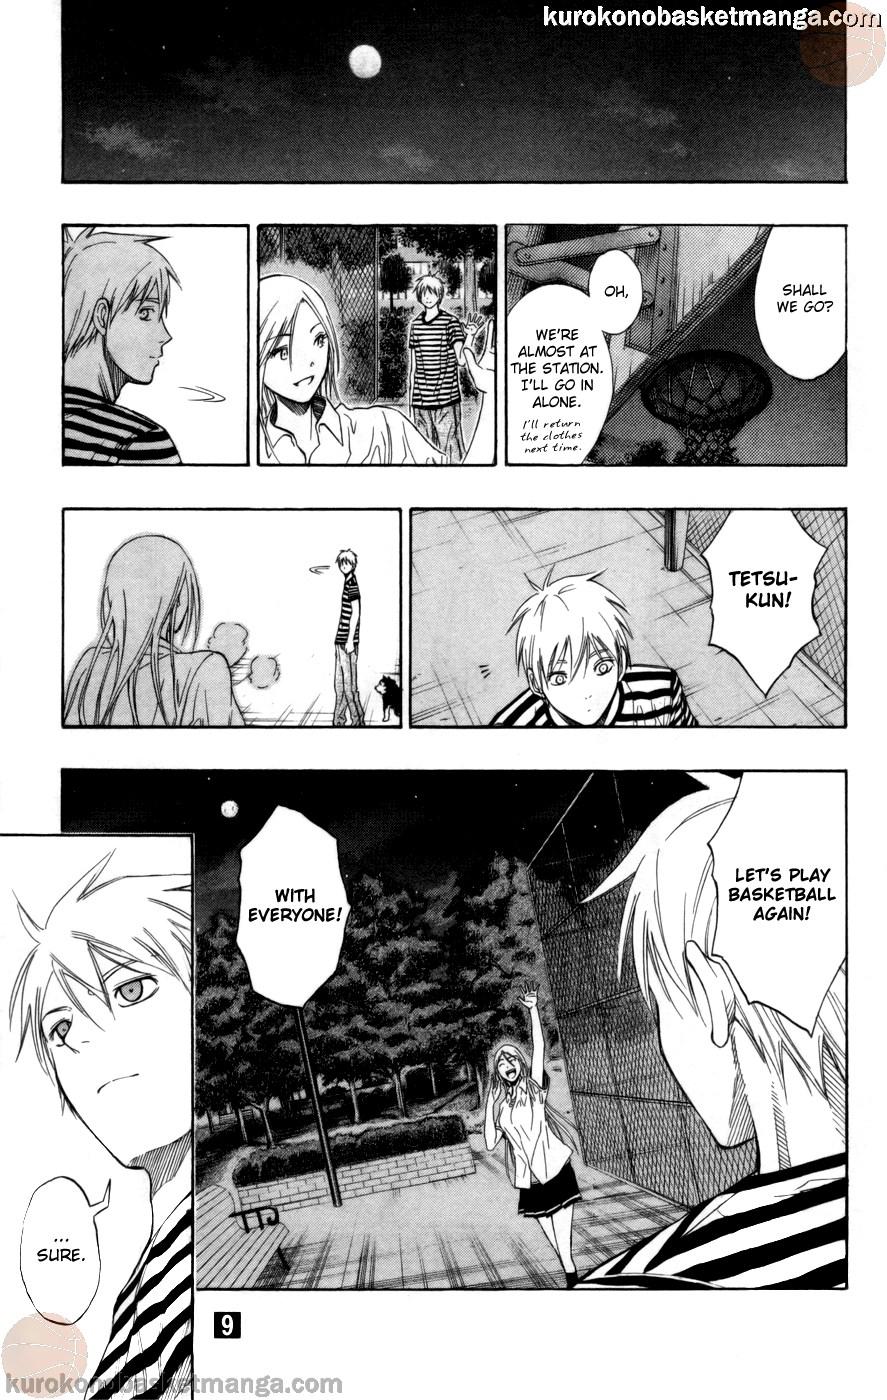 Kuroko no Basket Manga Chapter 80 - Image 19